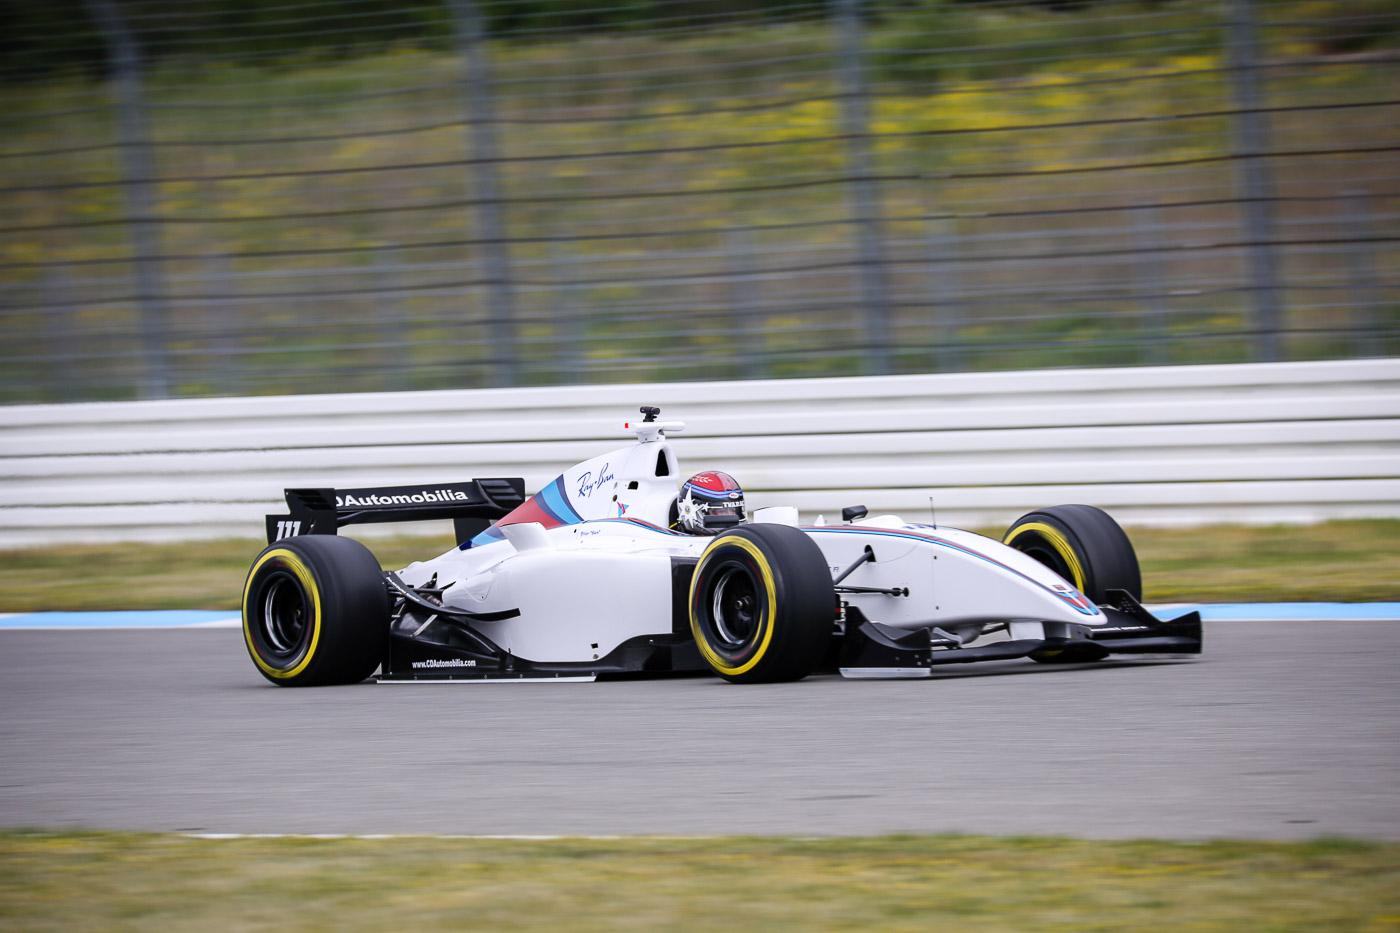 Dallara - World Series by Renault 3.5